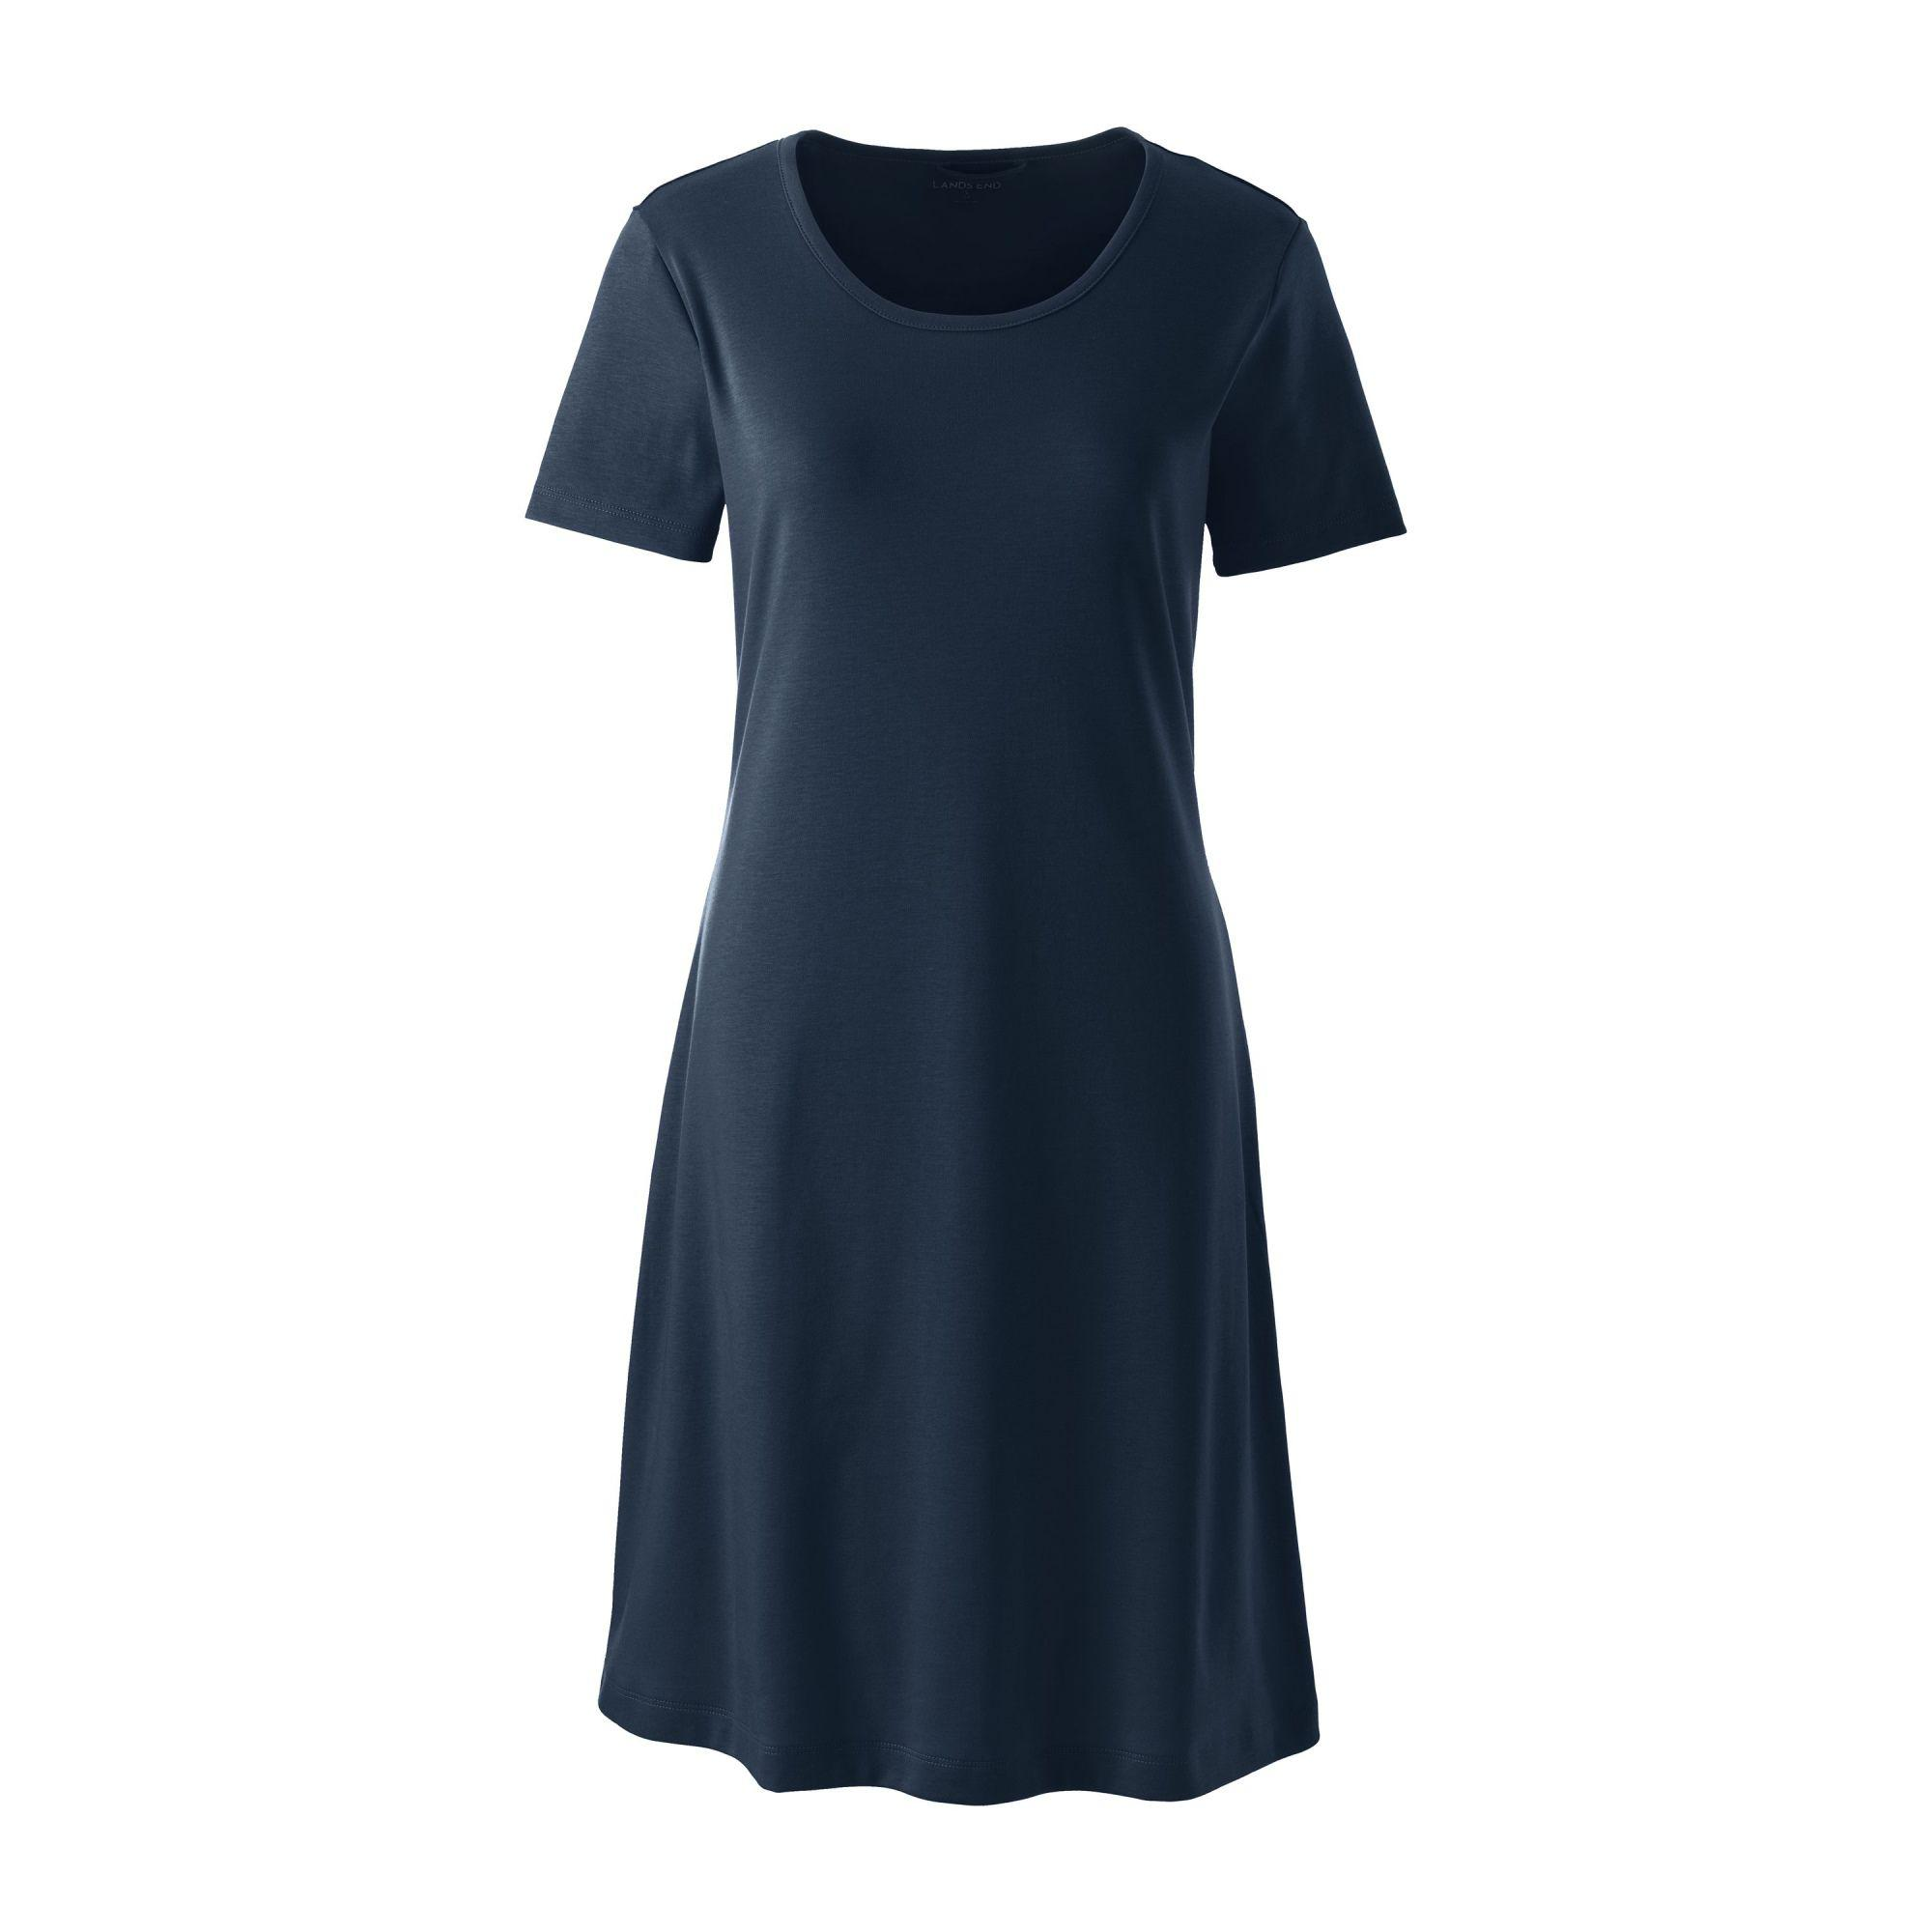 Lands  End - Blue Petite Supima Nightdress - Lyst. View fullscreen 96d75fd02